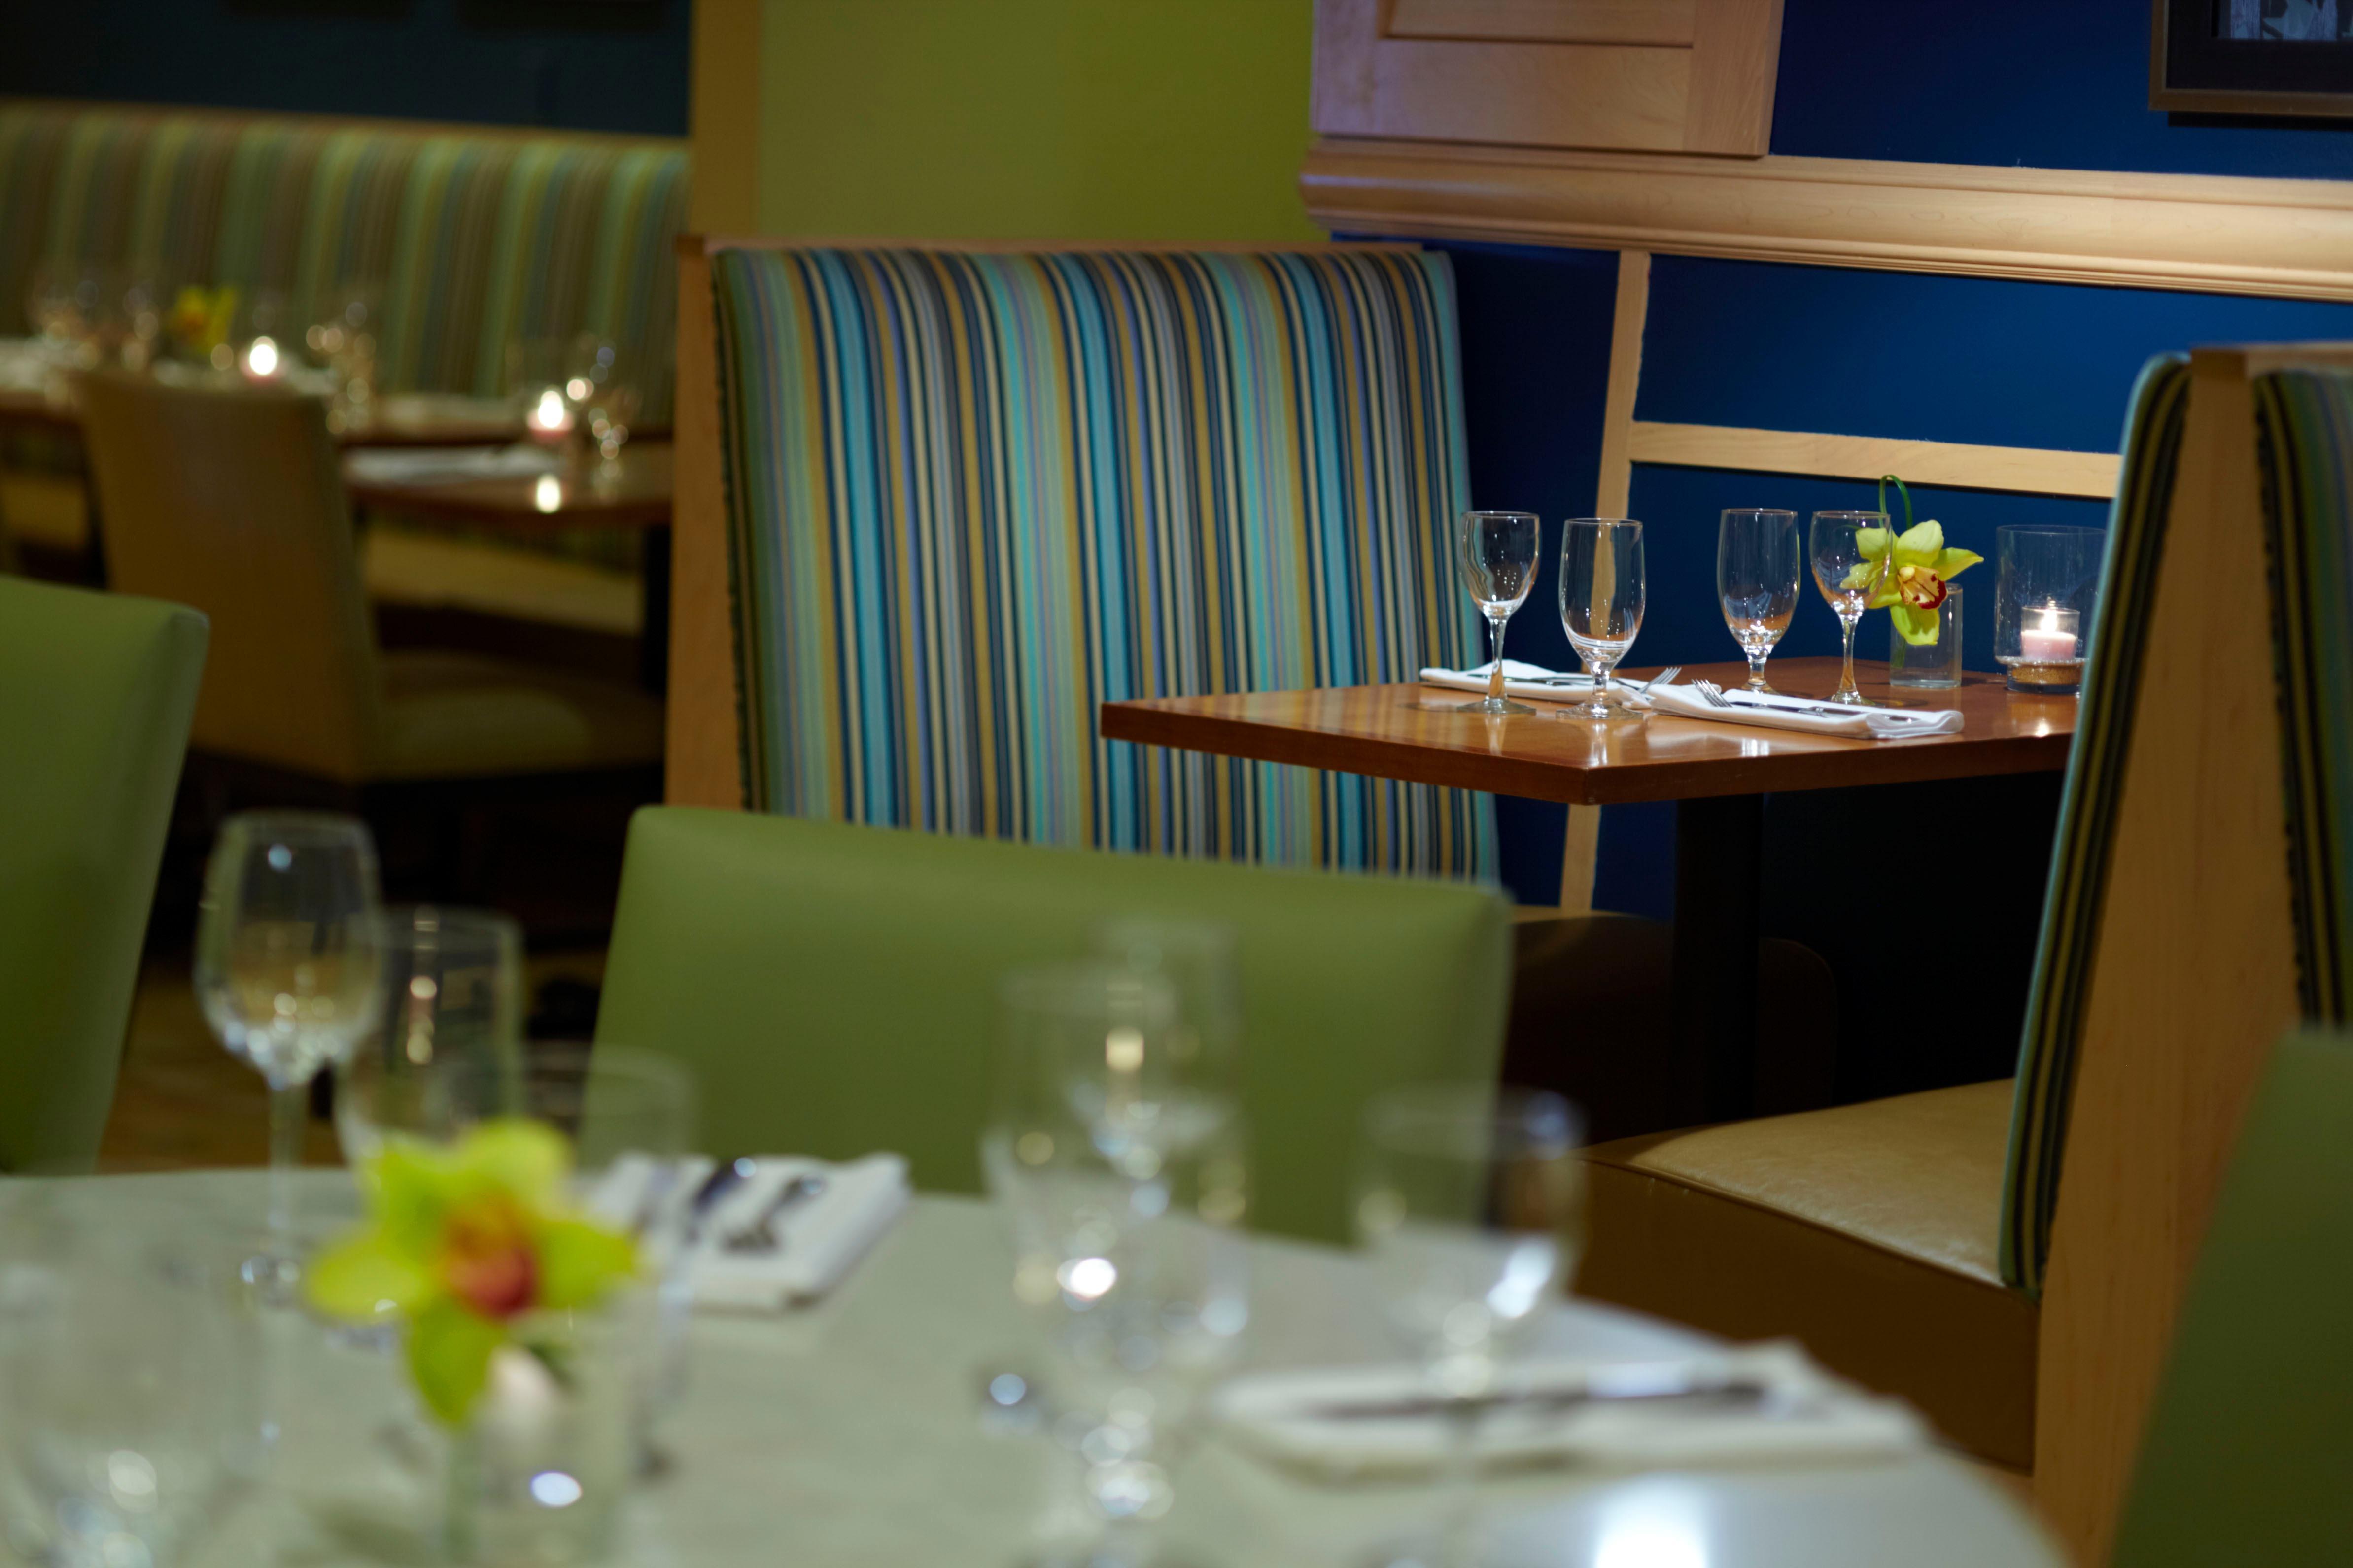 Renaissance Fort Lauderdale Cruise Port Hotel image 15